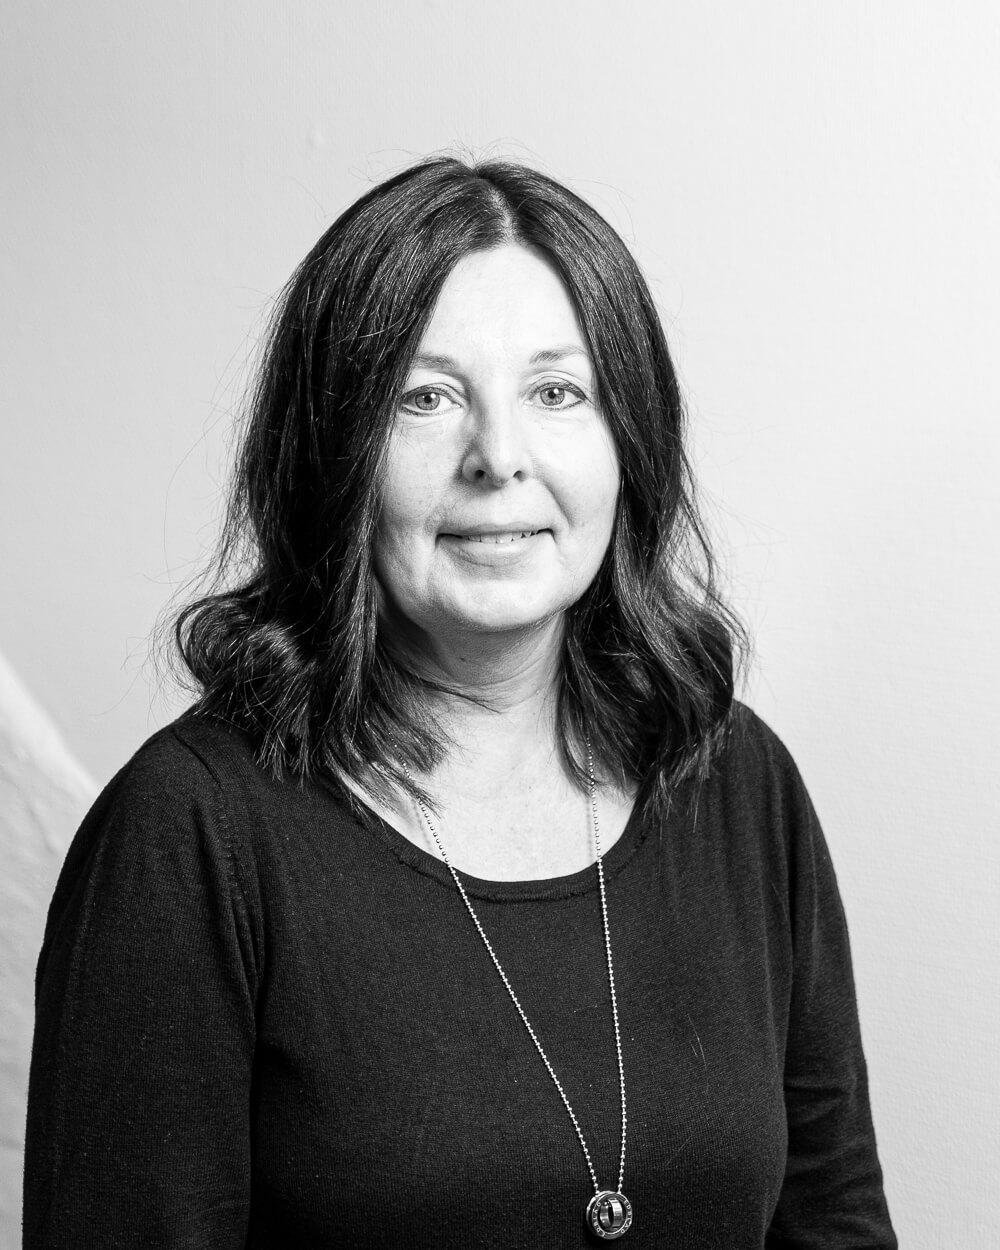 Ulrika Sagerström